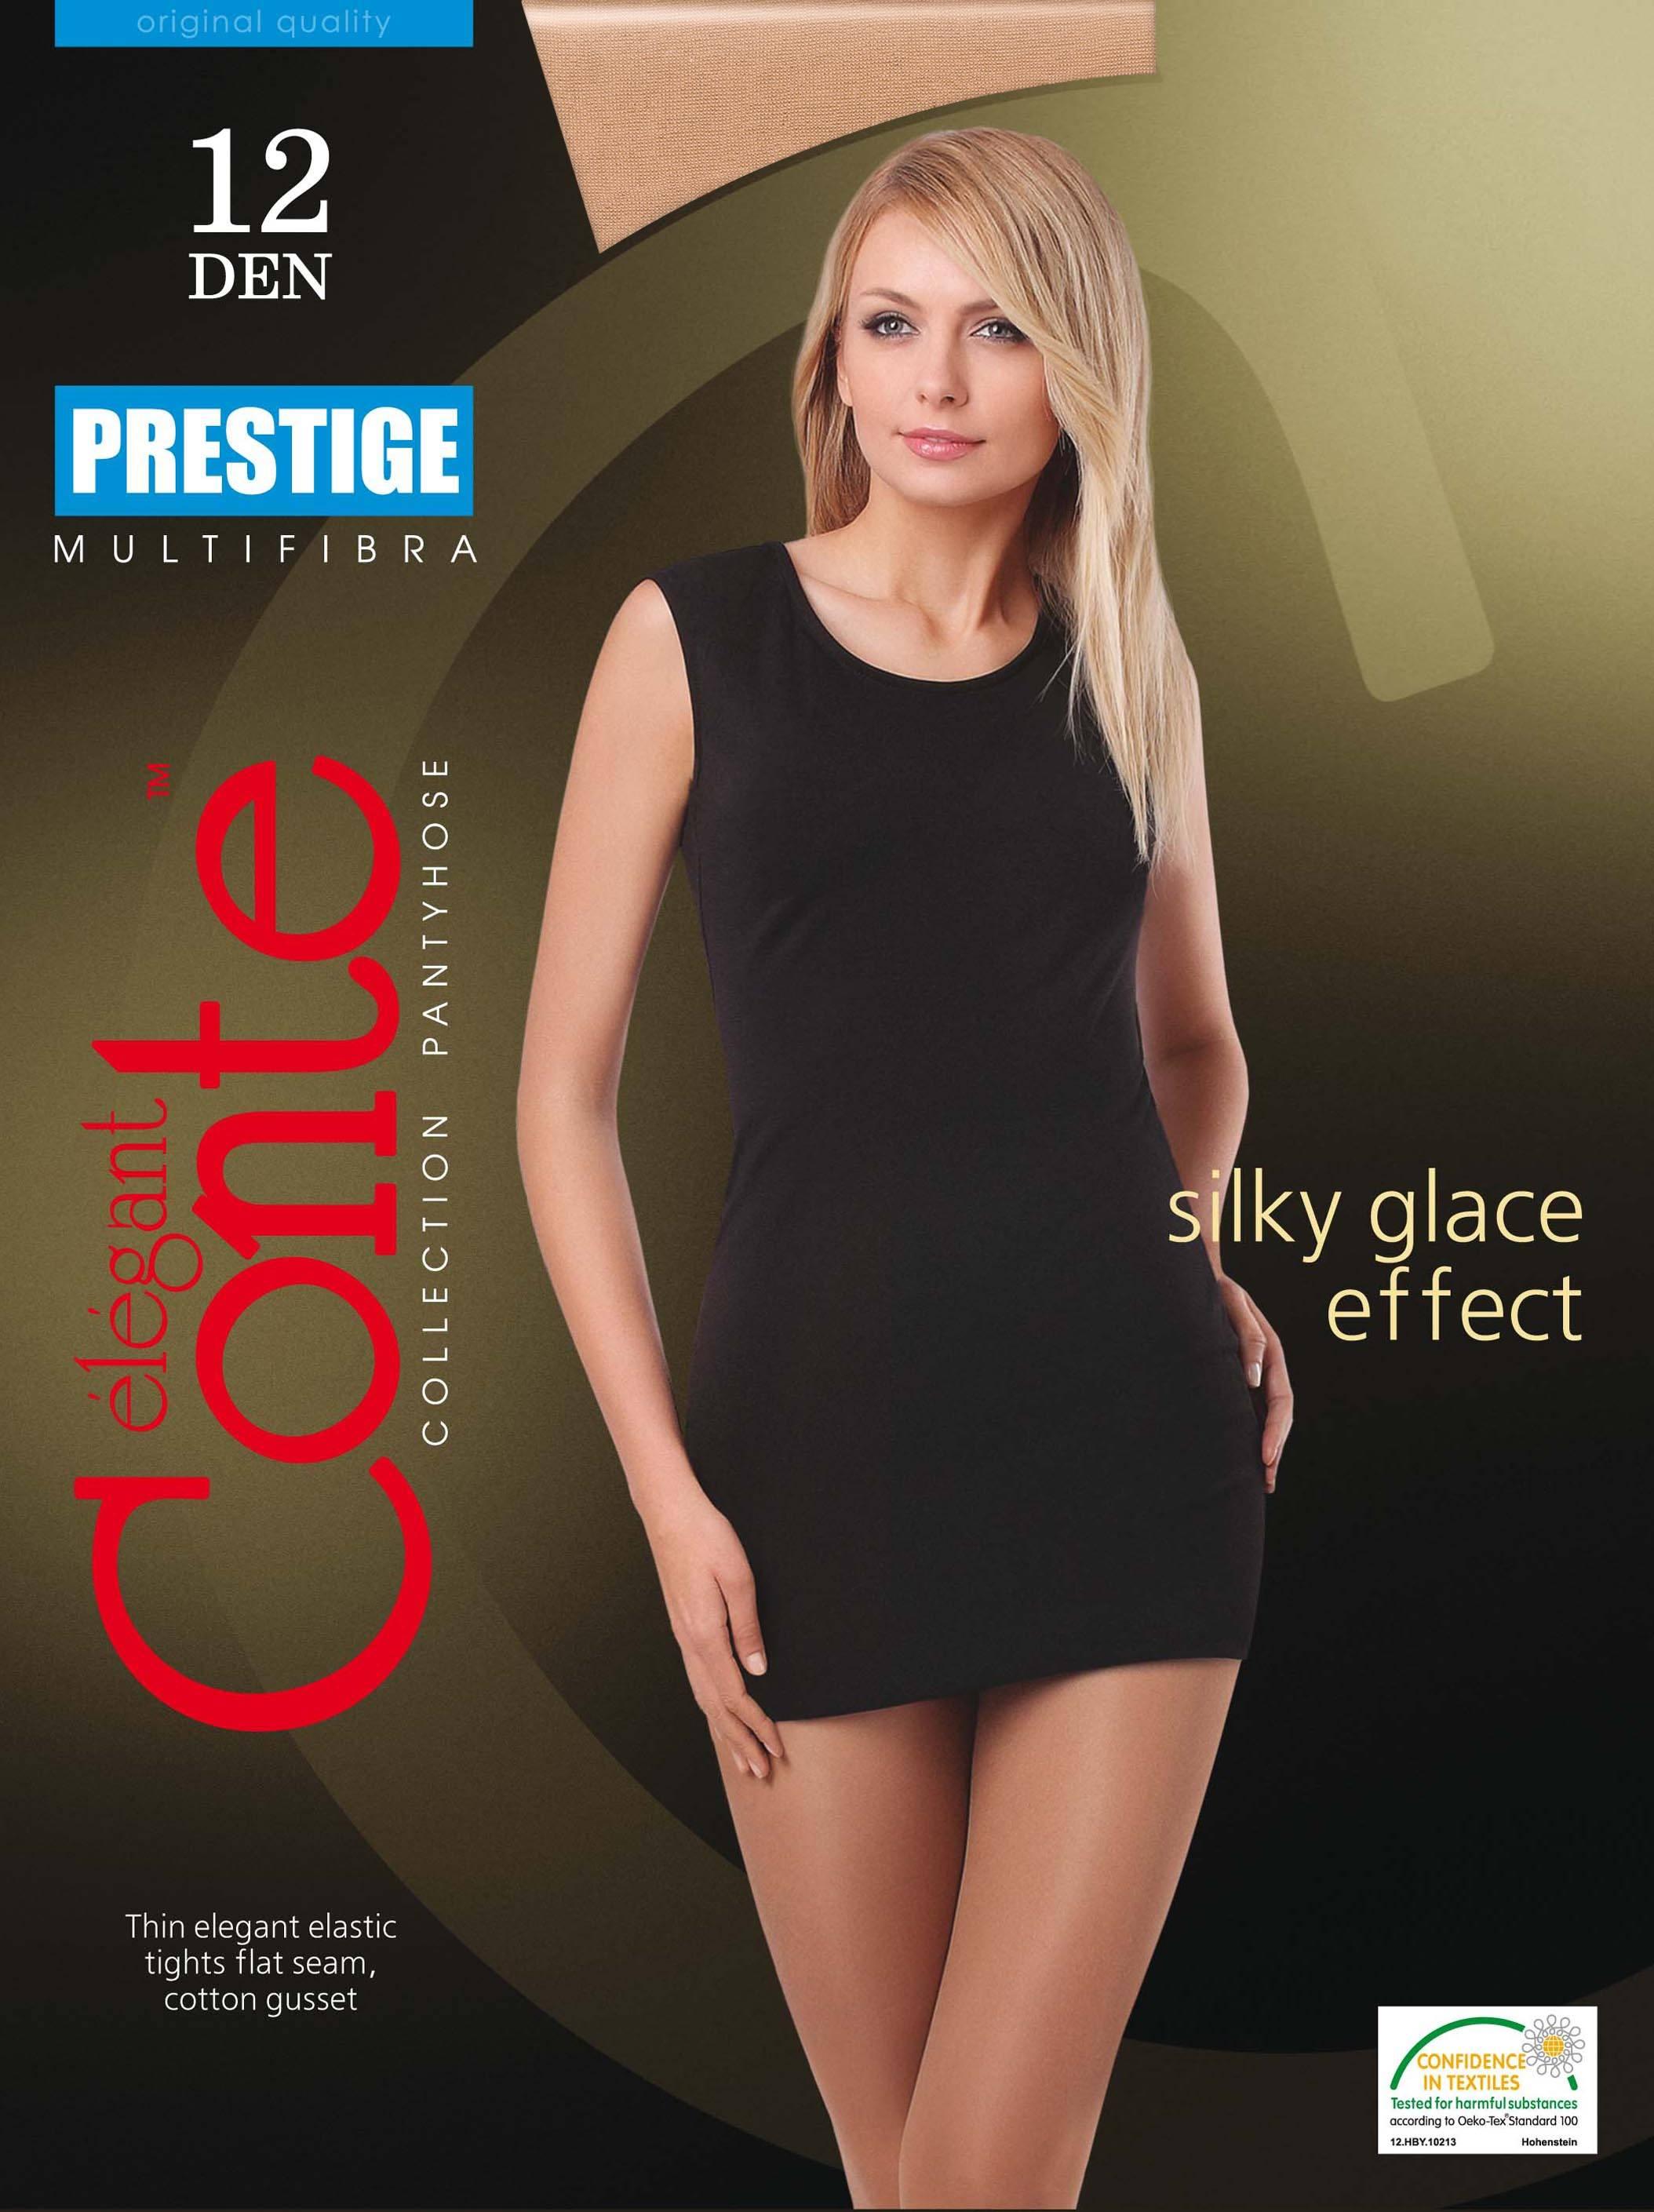 https://golden-legs.com.ua/images/stories/virtuemart/product/03bd09cc86c4b42e27541e5ffe86d409.jpg